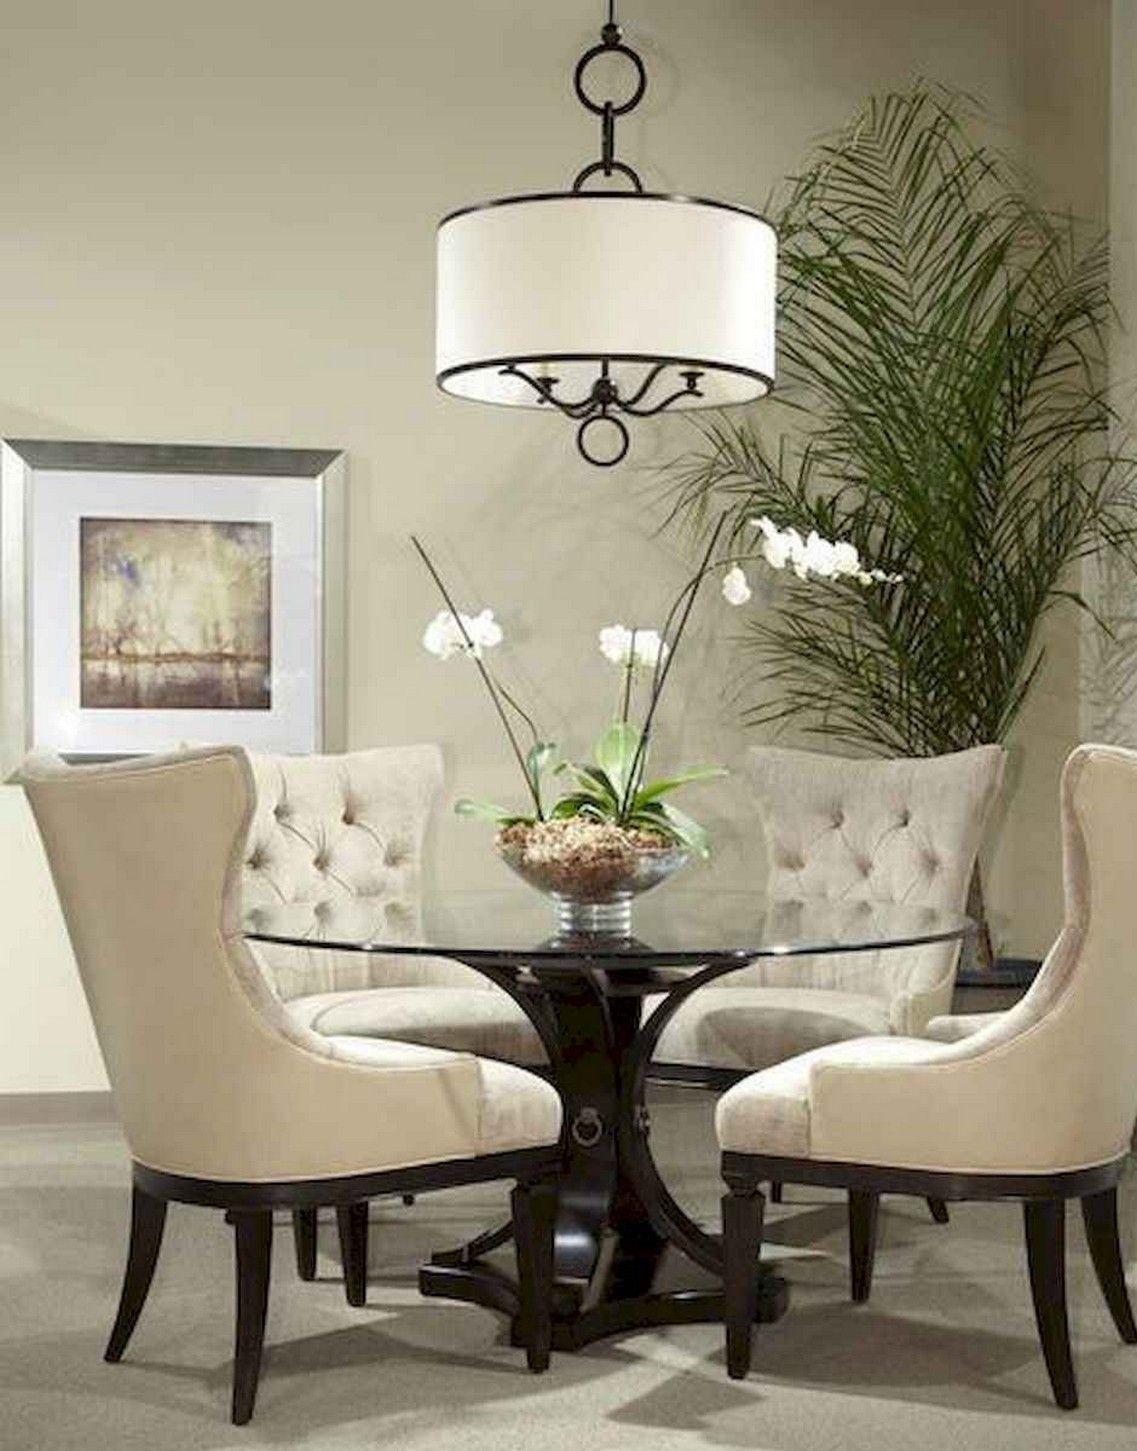 36+ Elegant lighting round dining table Best